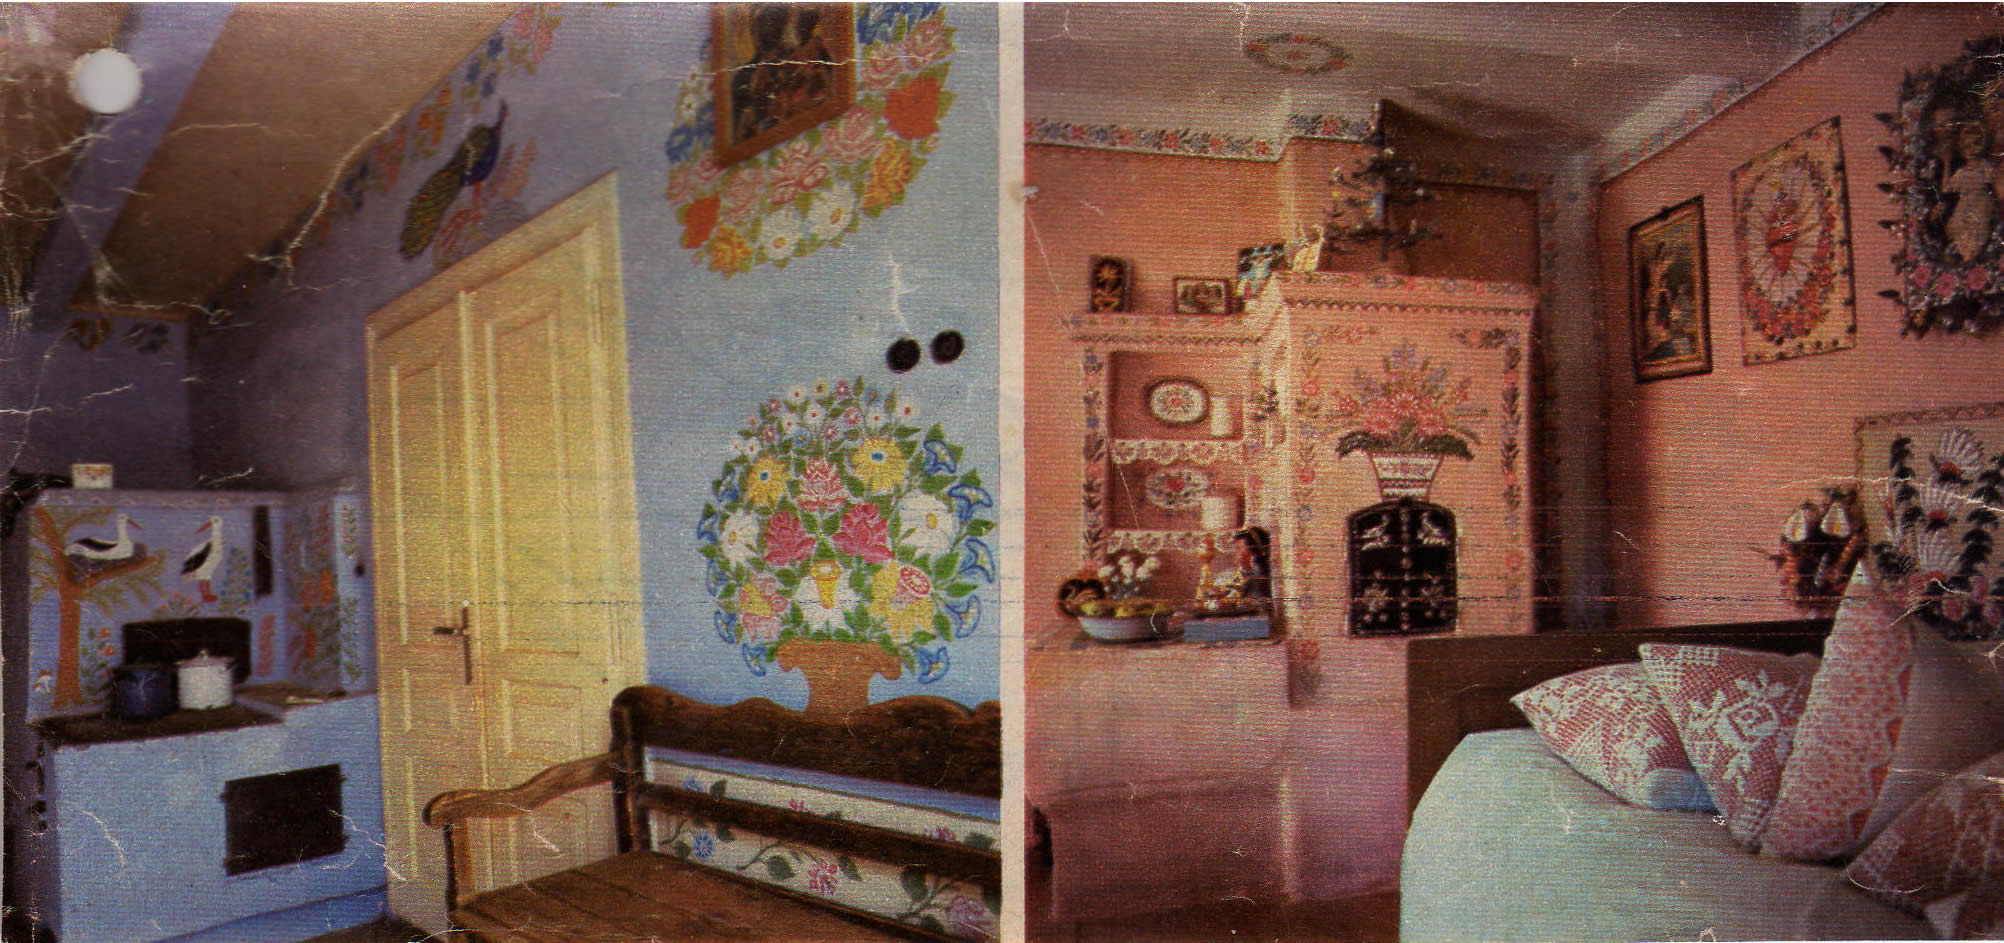 Bitacora muebles obtenga ideas dise o de muebles para su for Classic muebles uruguay